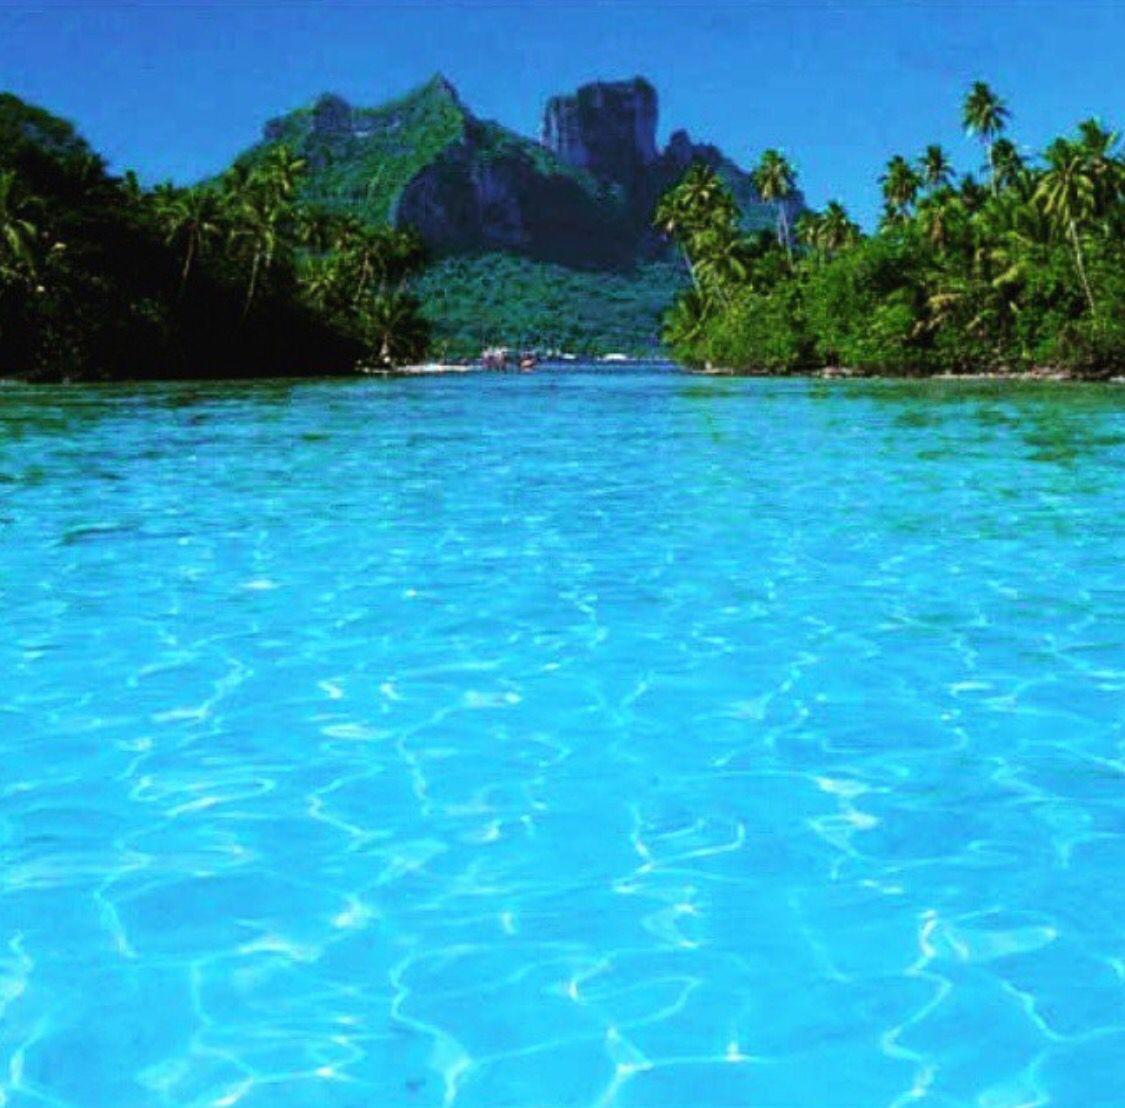 Blue view BlueOasisTropicalFrench PolynesiaTourismTravelLandscapesBeautiful Blue view